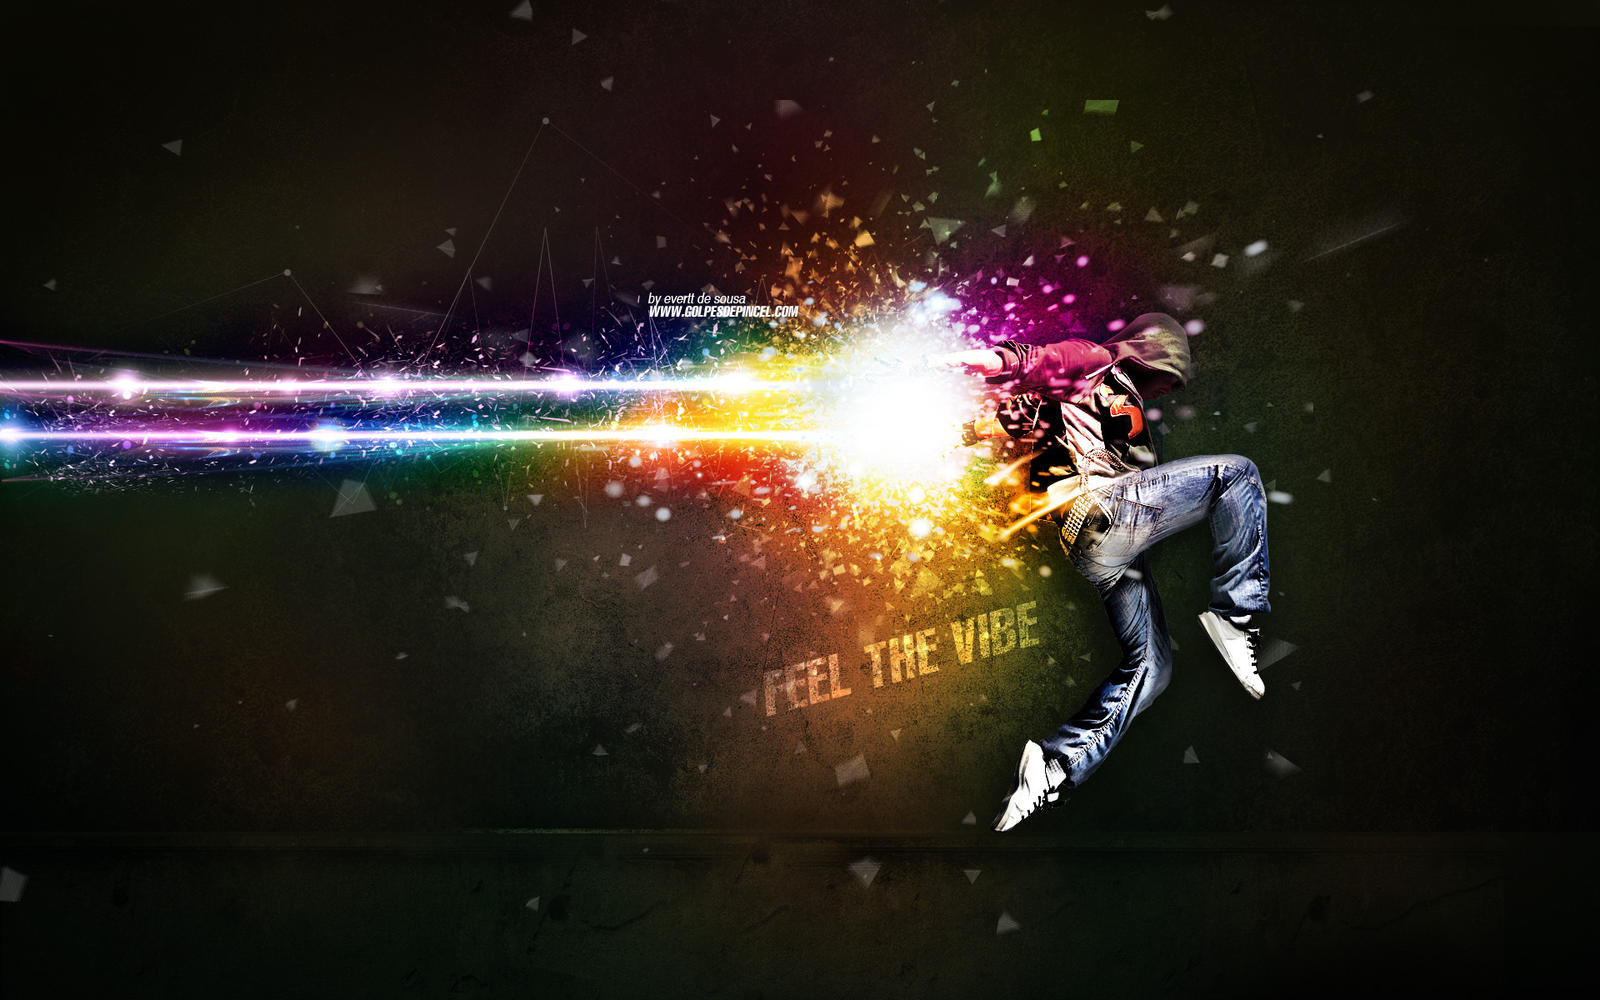 Feel The Vibe by TurokFreak